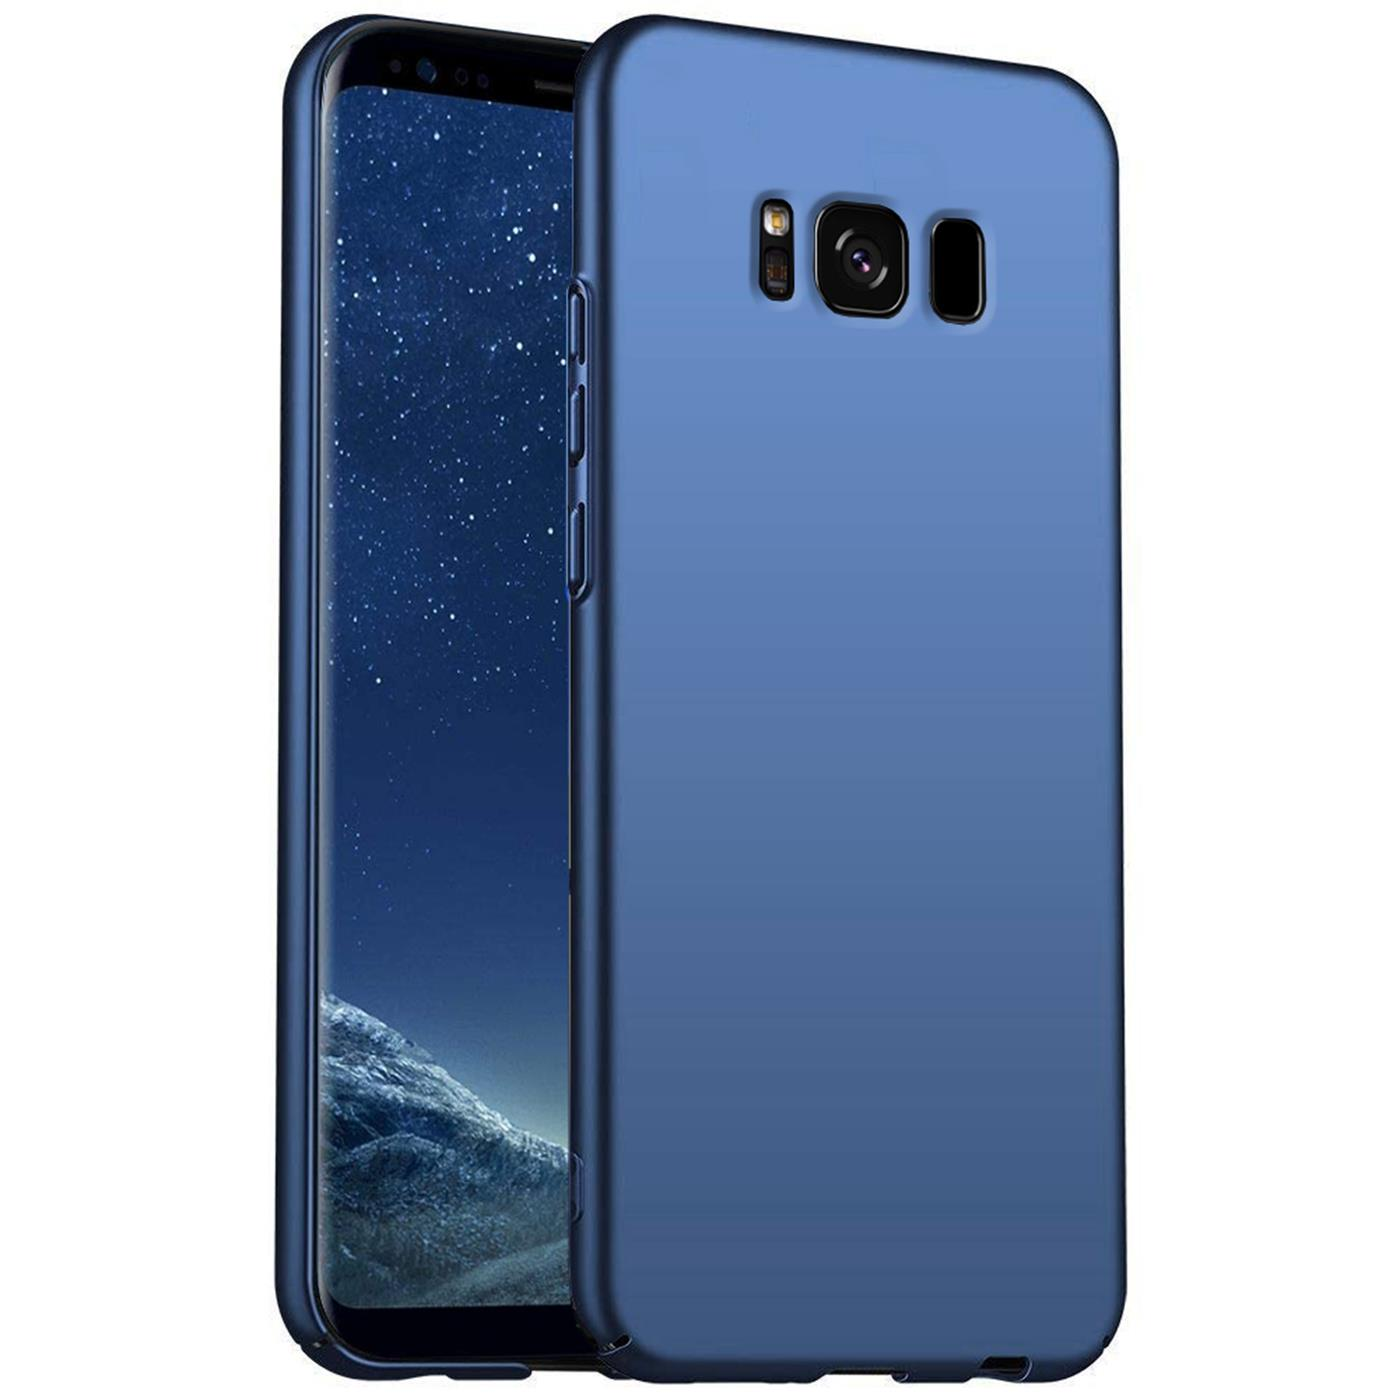 Hard-Back-Case-Cover-Samsung-Galaxy-j3-2016-duenn-Cover-Slim-Shockproof-Rugged Indexbild 10